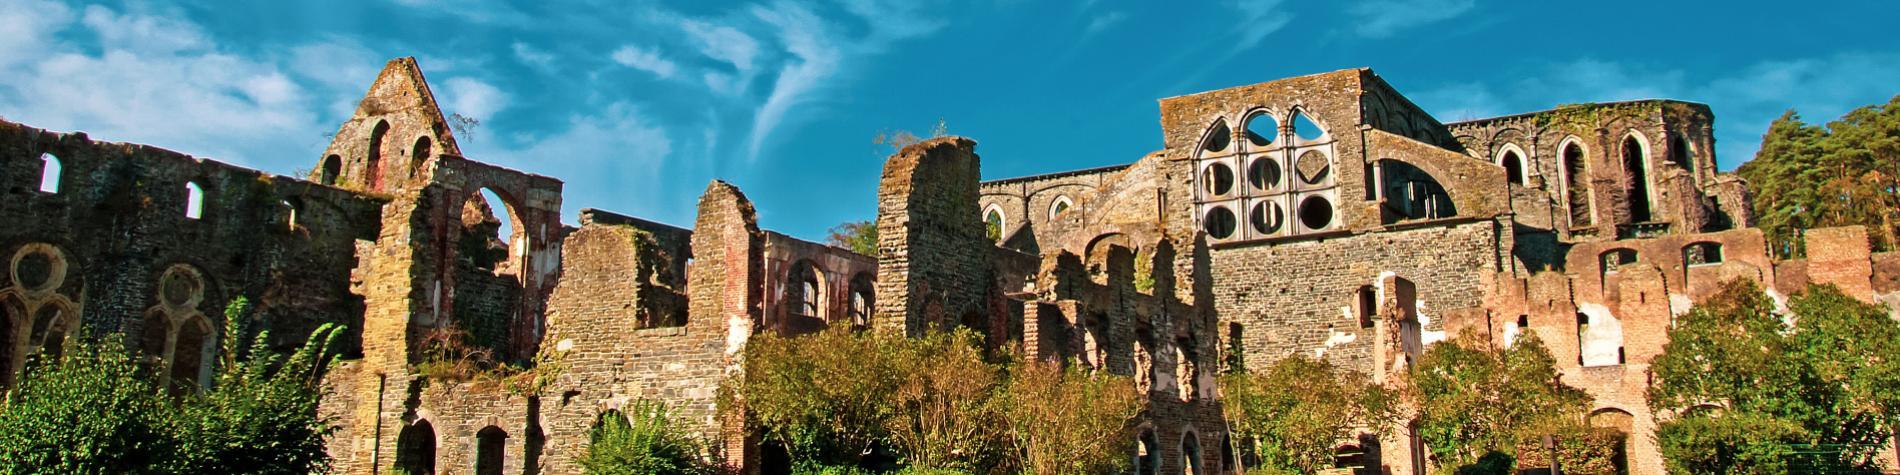 Abbaye de Villers-la-Ville - Ruines